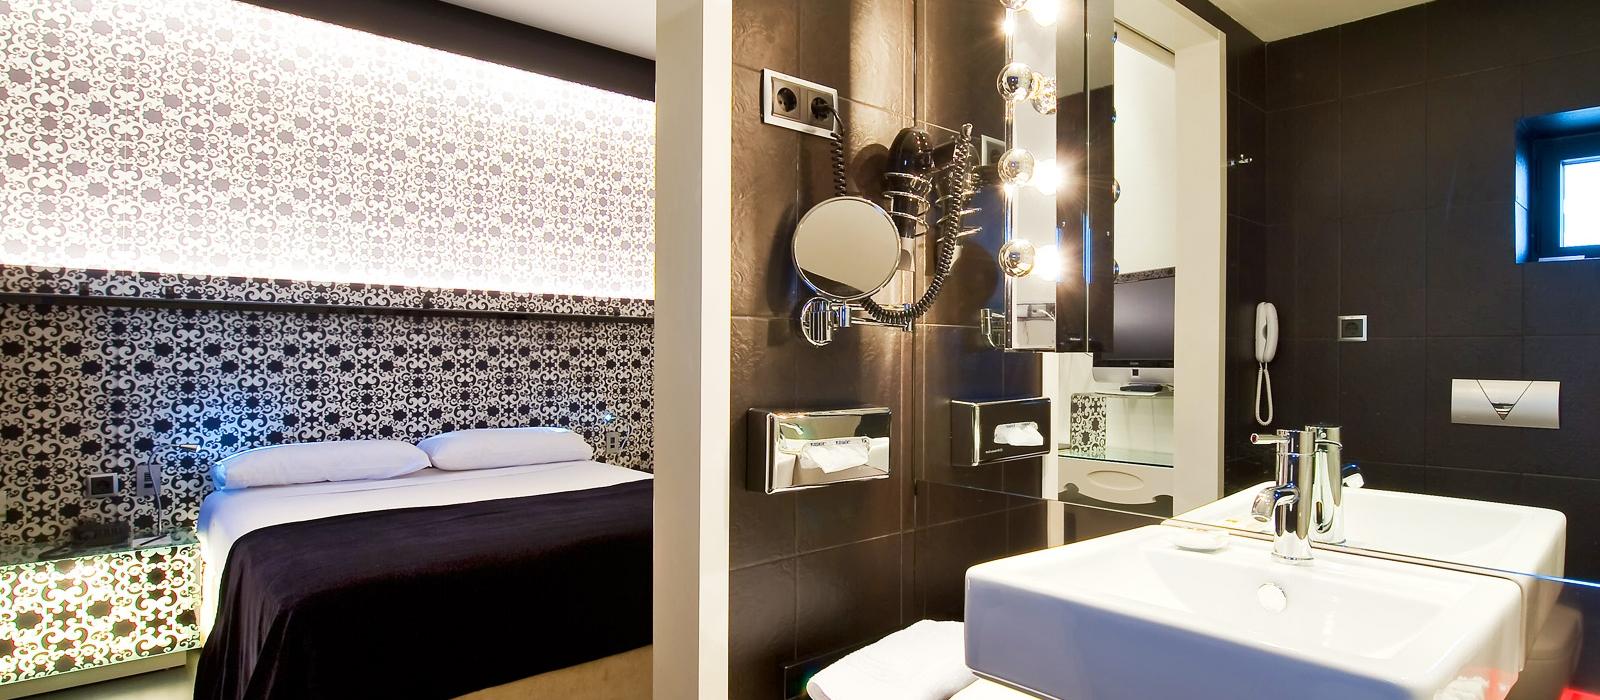 Camere Hotel Madrid Via 66 - Vincci Hoteles - Camera Singola